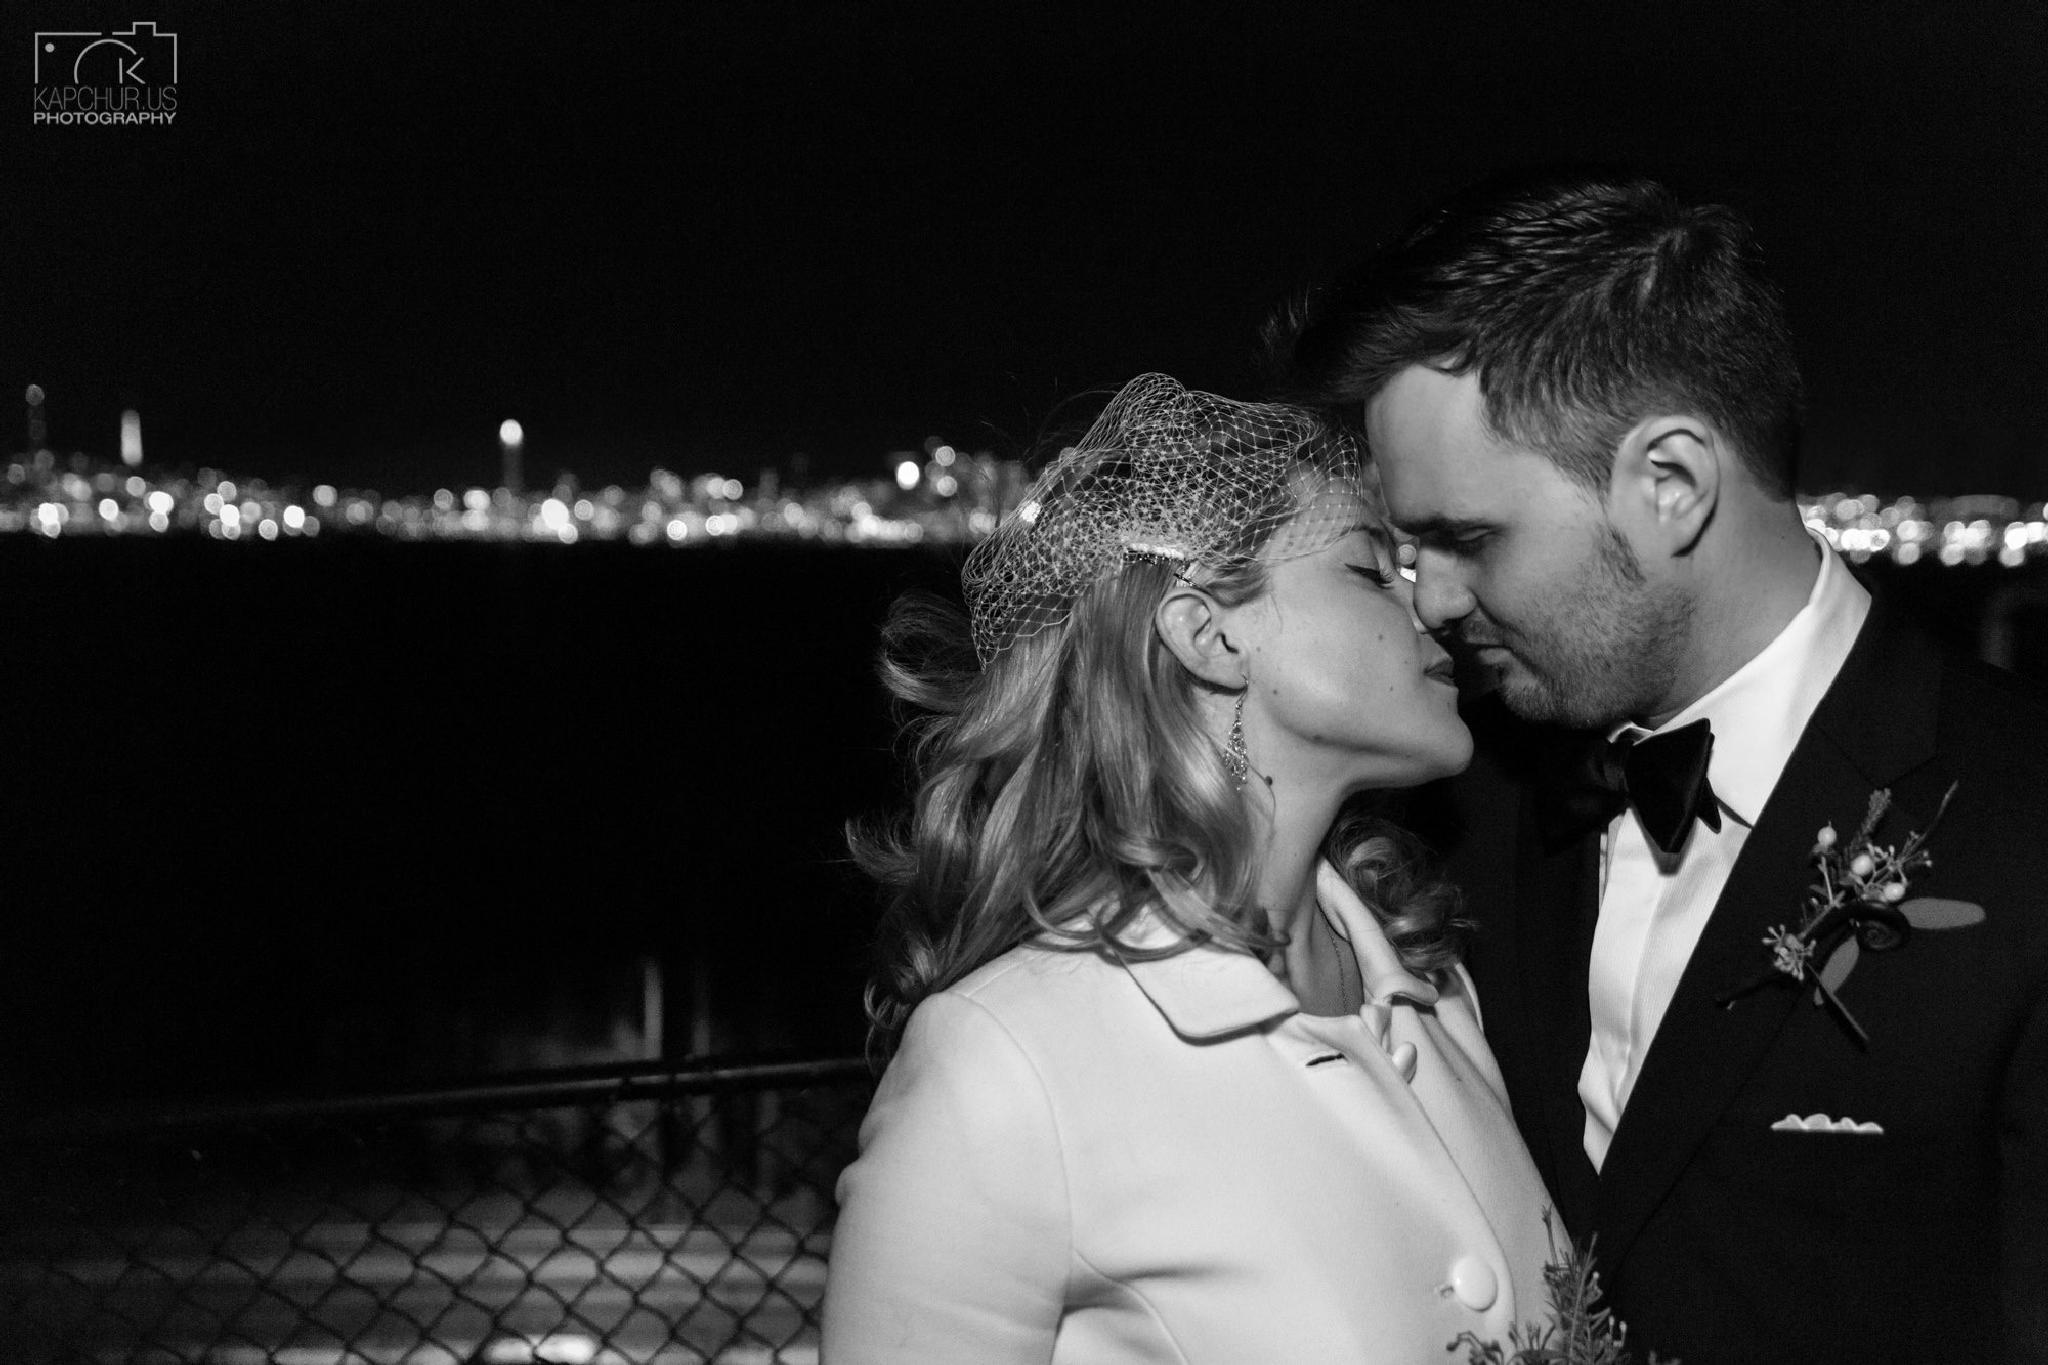 NYE Wedding 2015 by kapchur.us photography (Richard Wood)